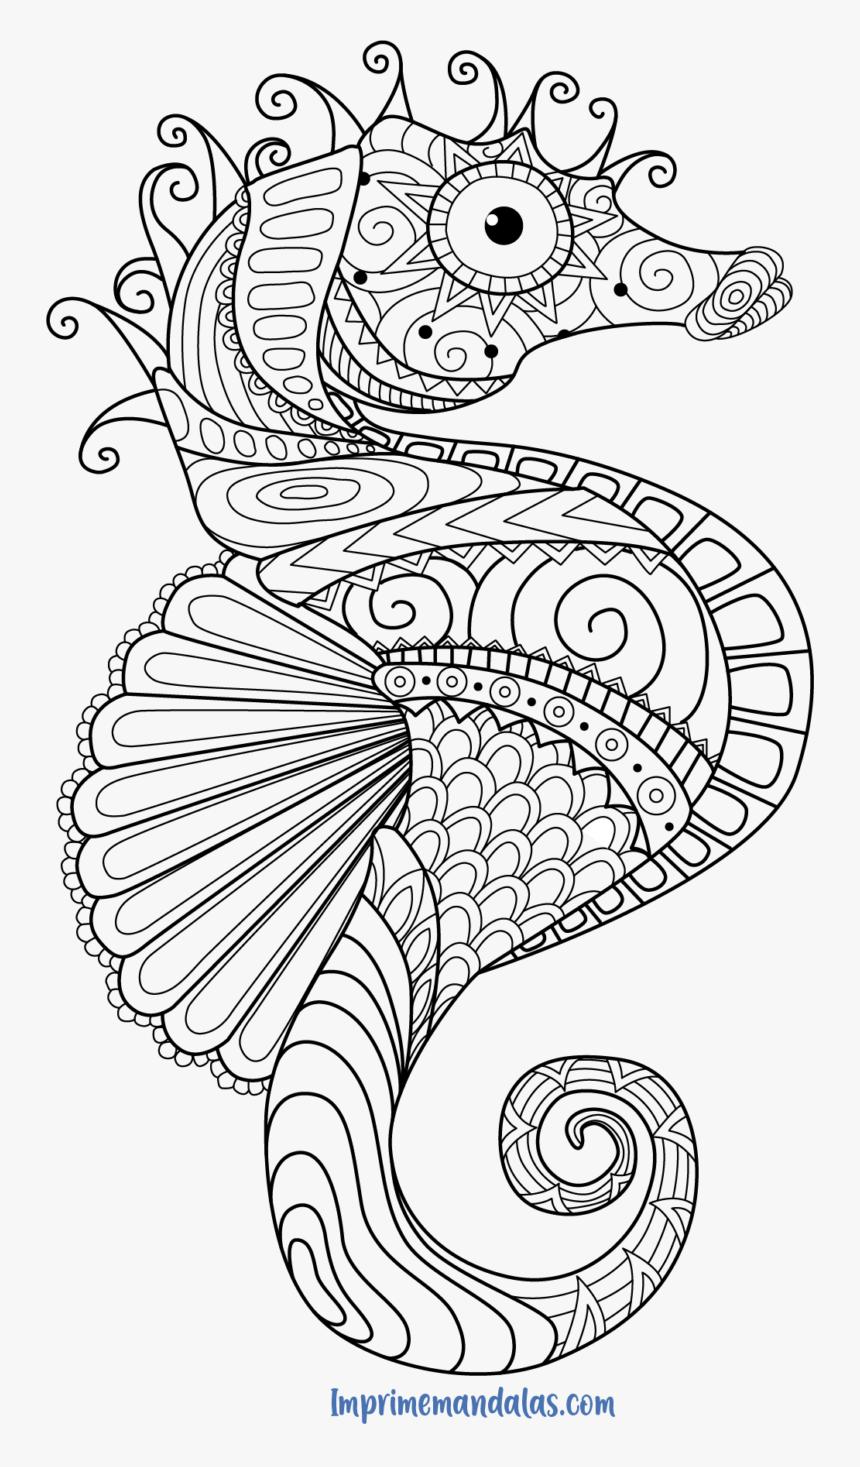 Mandala Caballito De Mar Para Colorear Seahorse Coloring Pages For Adults Hd Png Download Transparent Png Image Pngitem